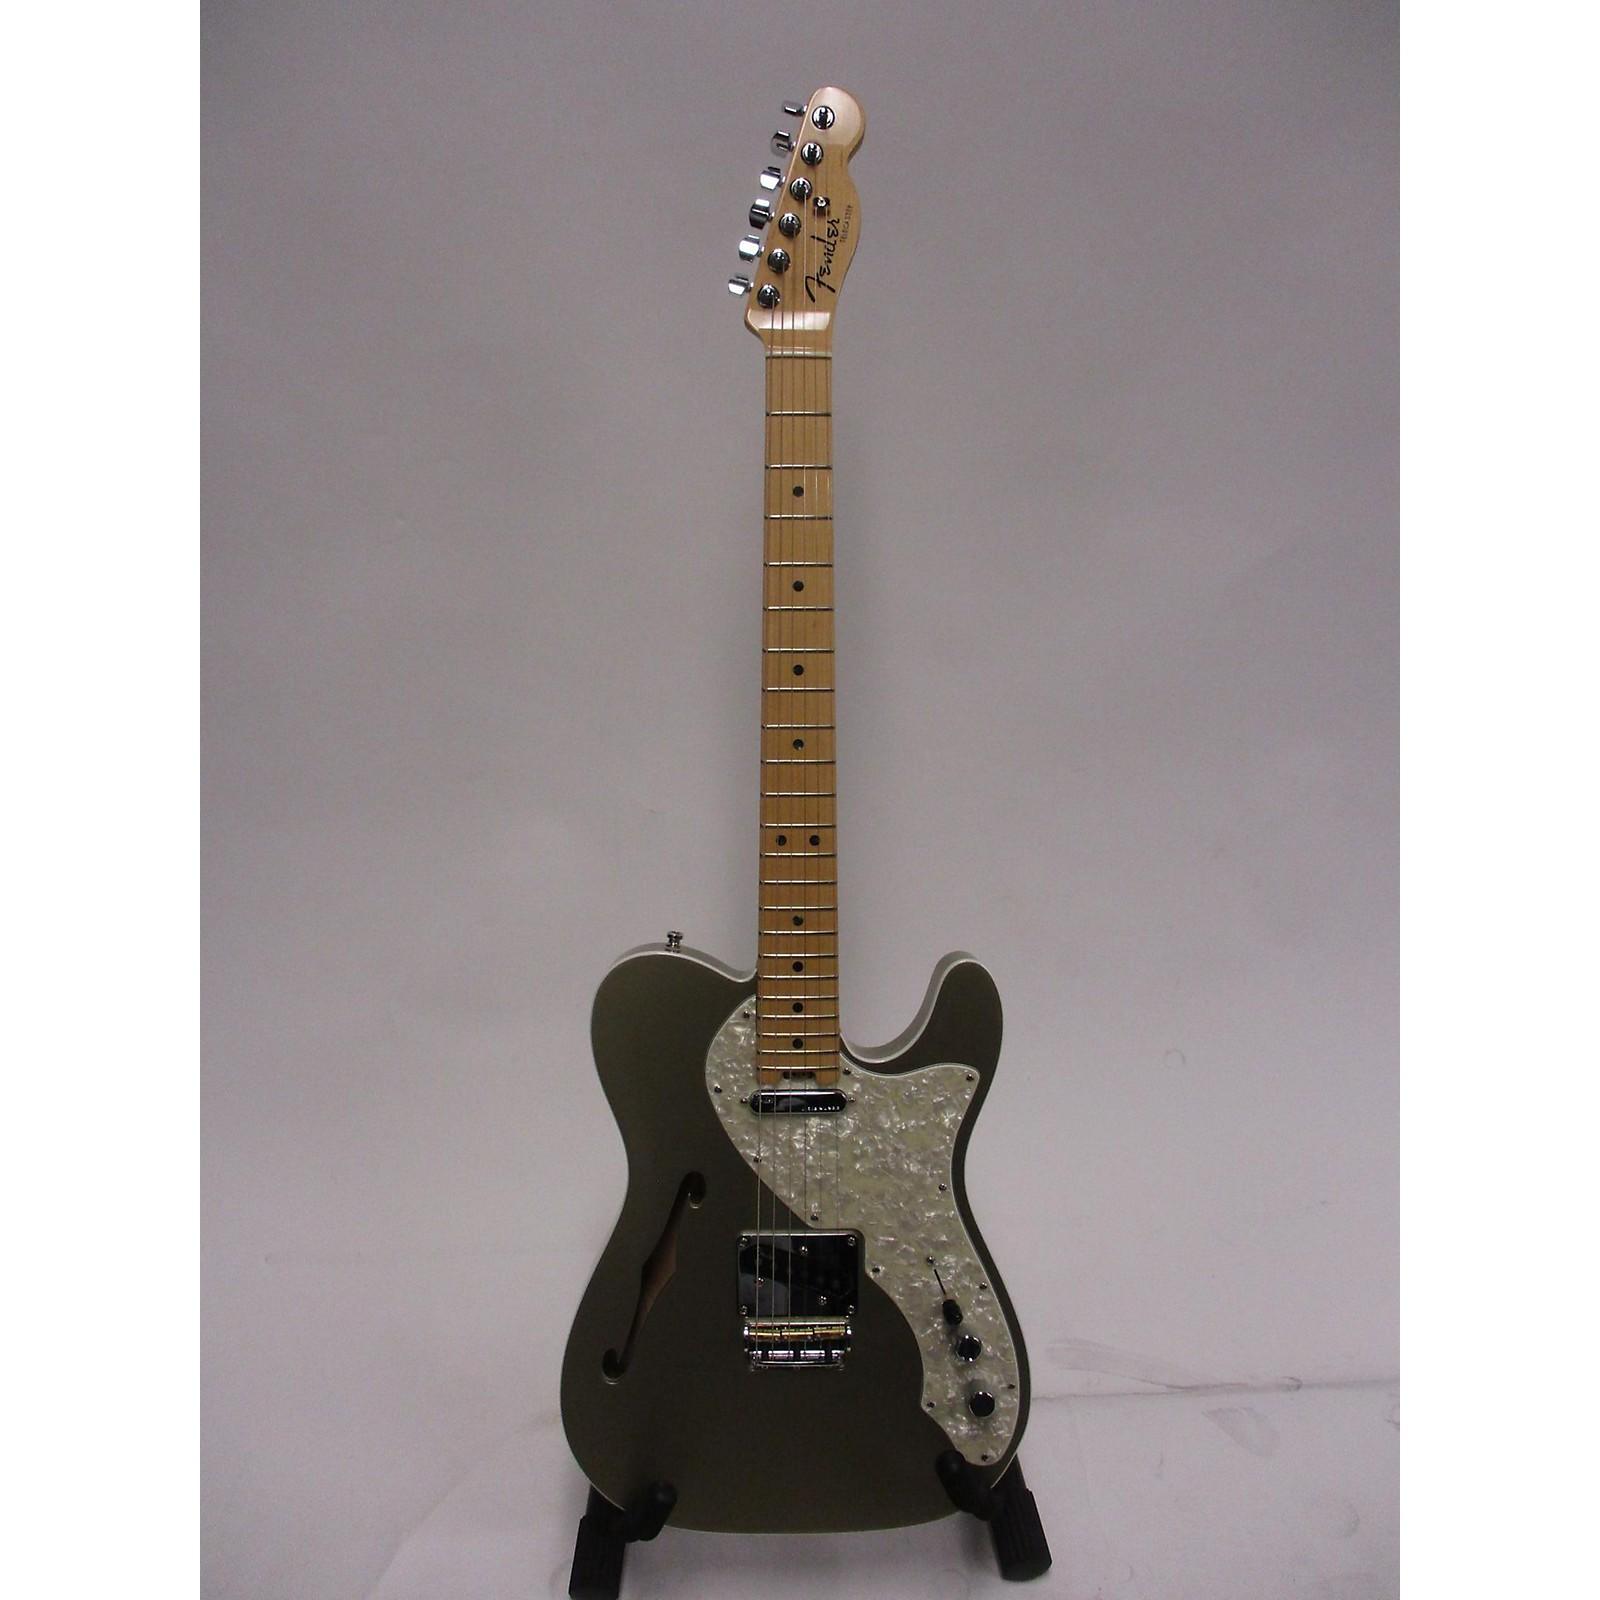 Fender 2017 American Elite Thinline Telecaster Hollow Body Electric Guitar